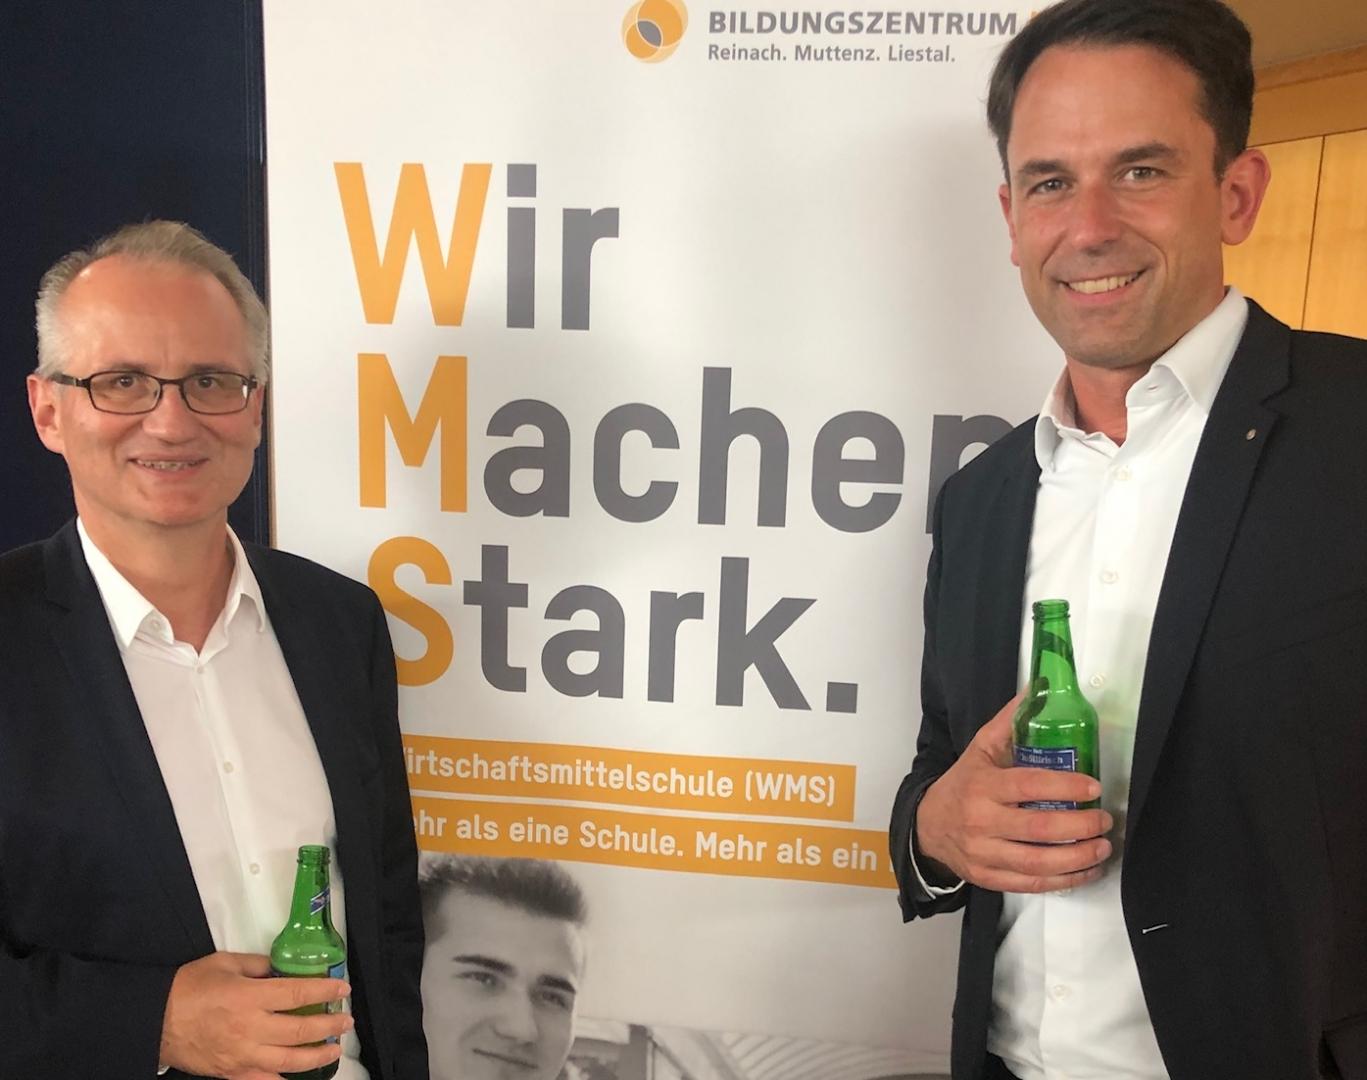 FDP-Fraktionspräsidium mit Dürr und Stückelberger